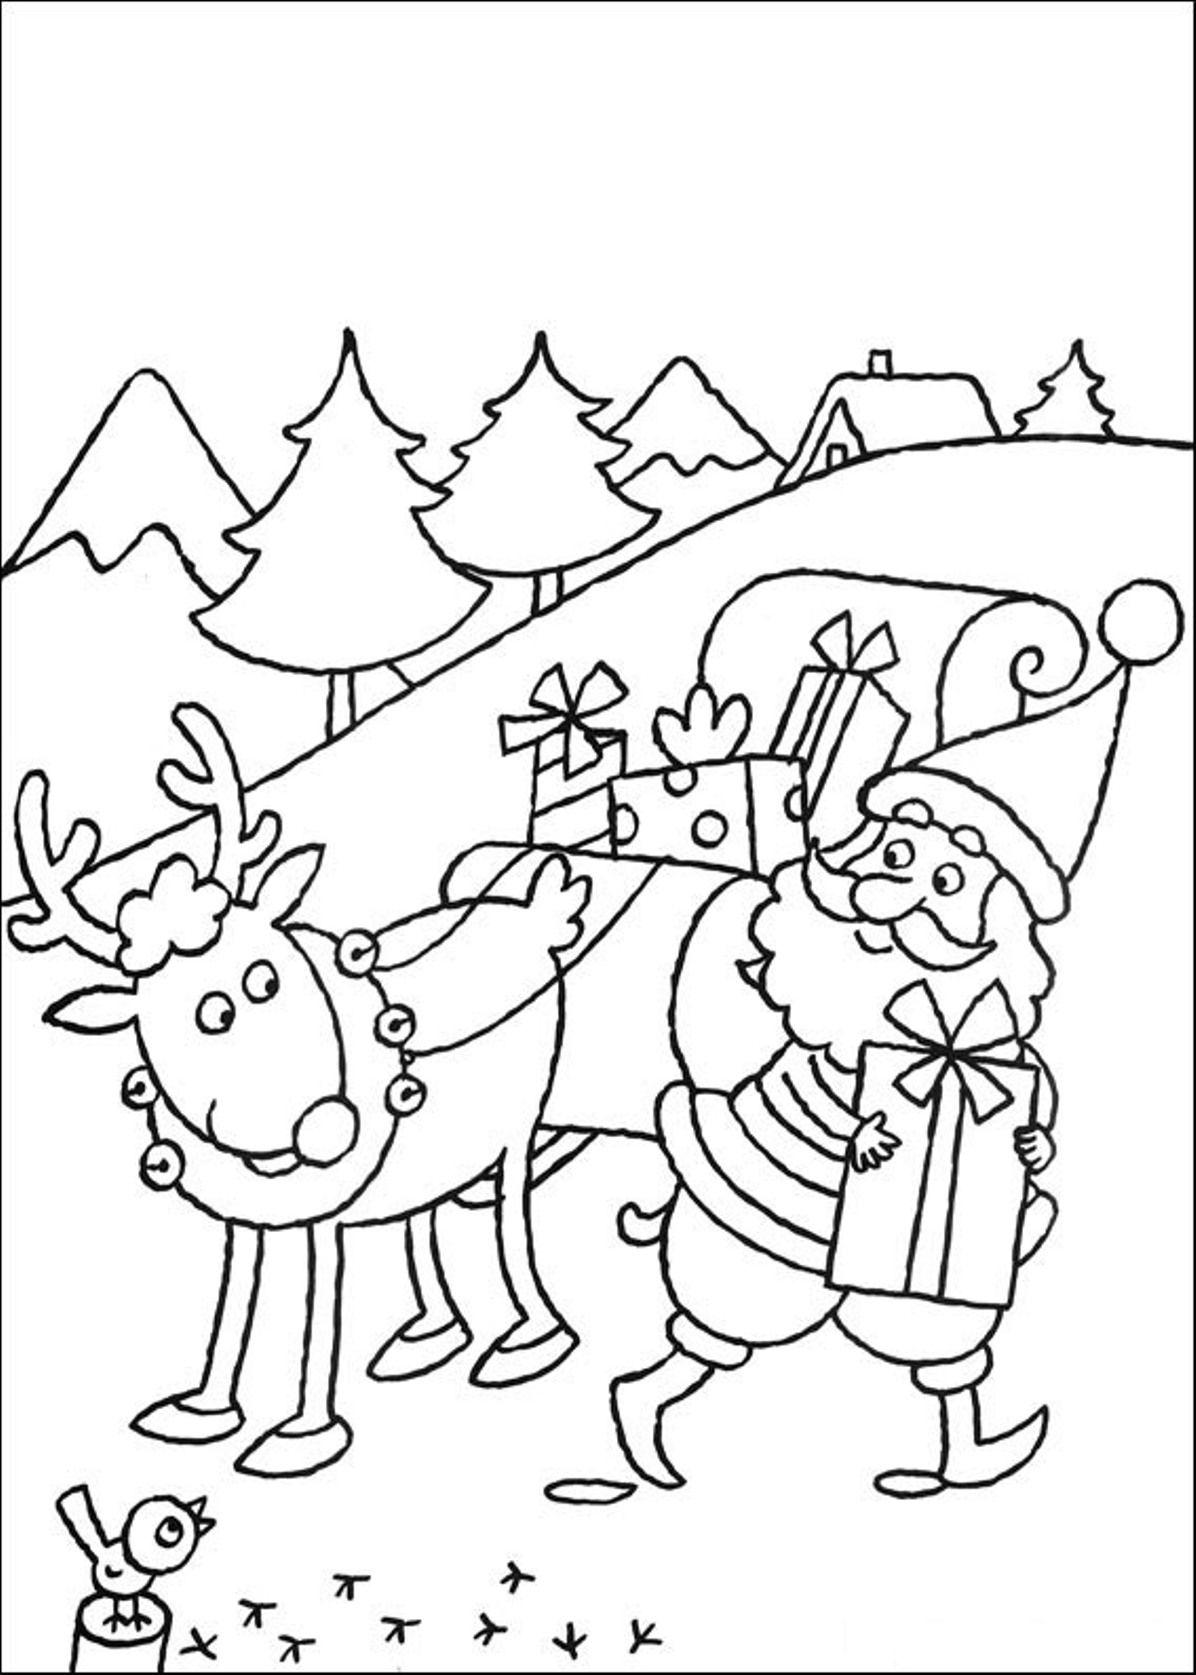 Rudolph Reindeer Coloring Page Santa - Coloring Home